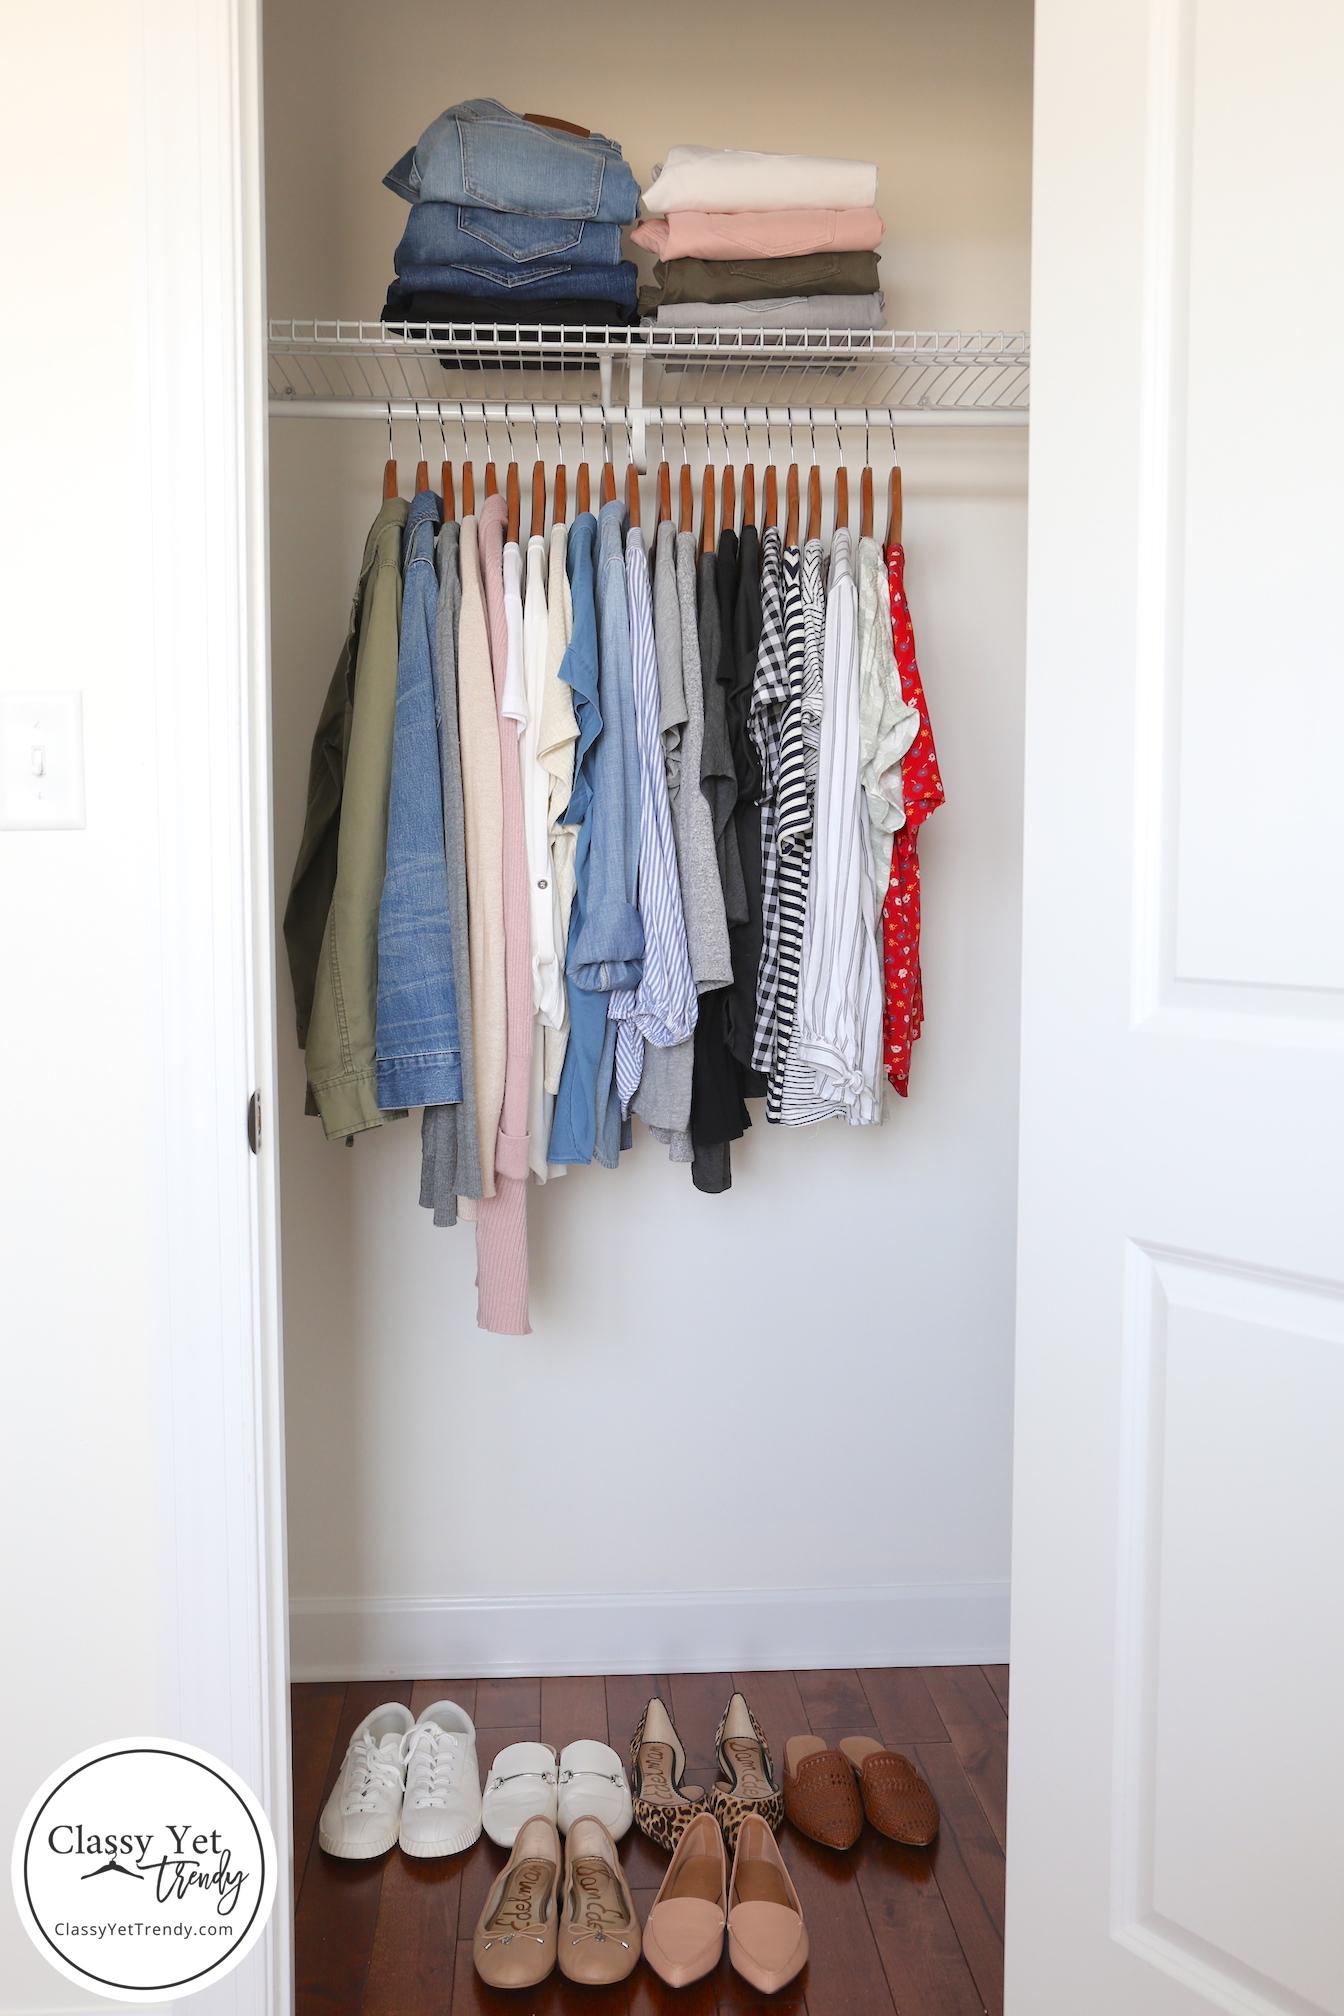 My 30-Piece Spring 2019 Capsule Wardrobe And Closet Tour